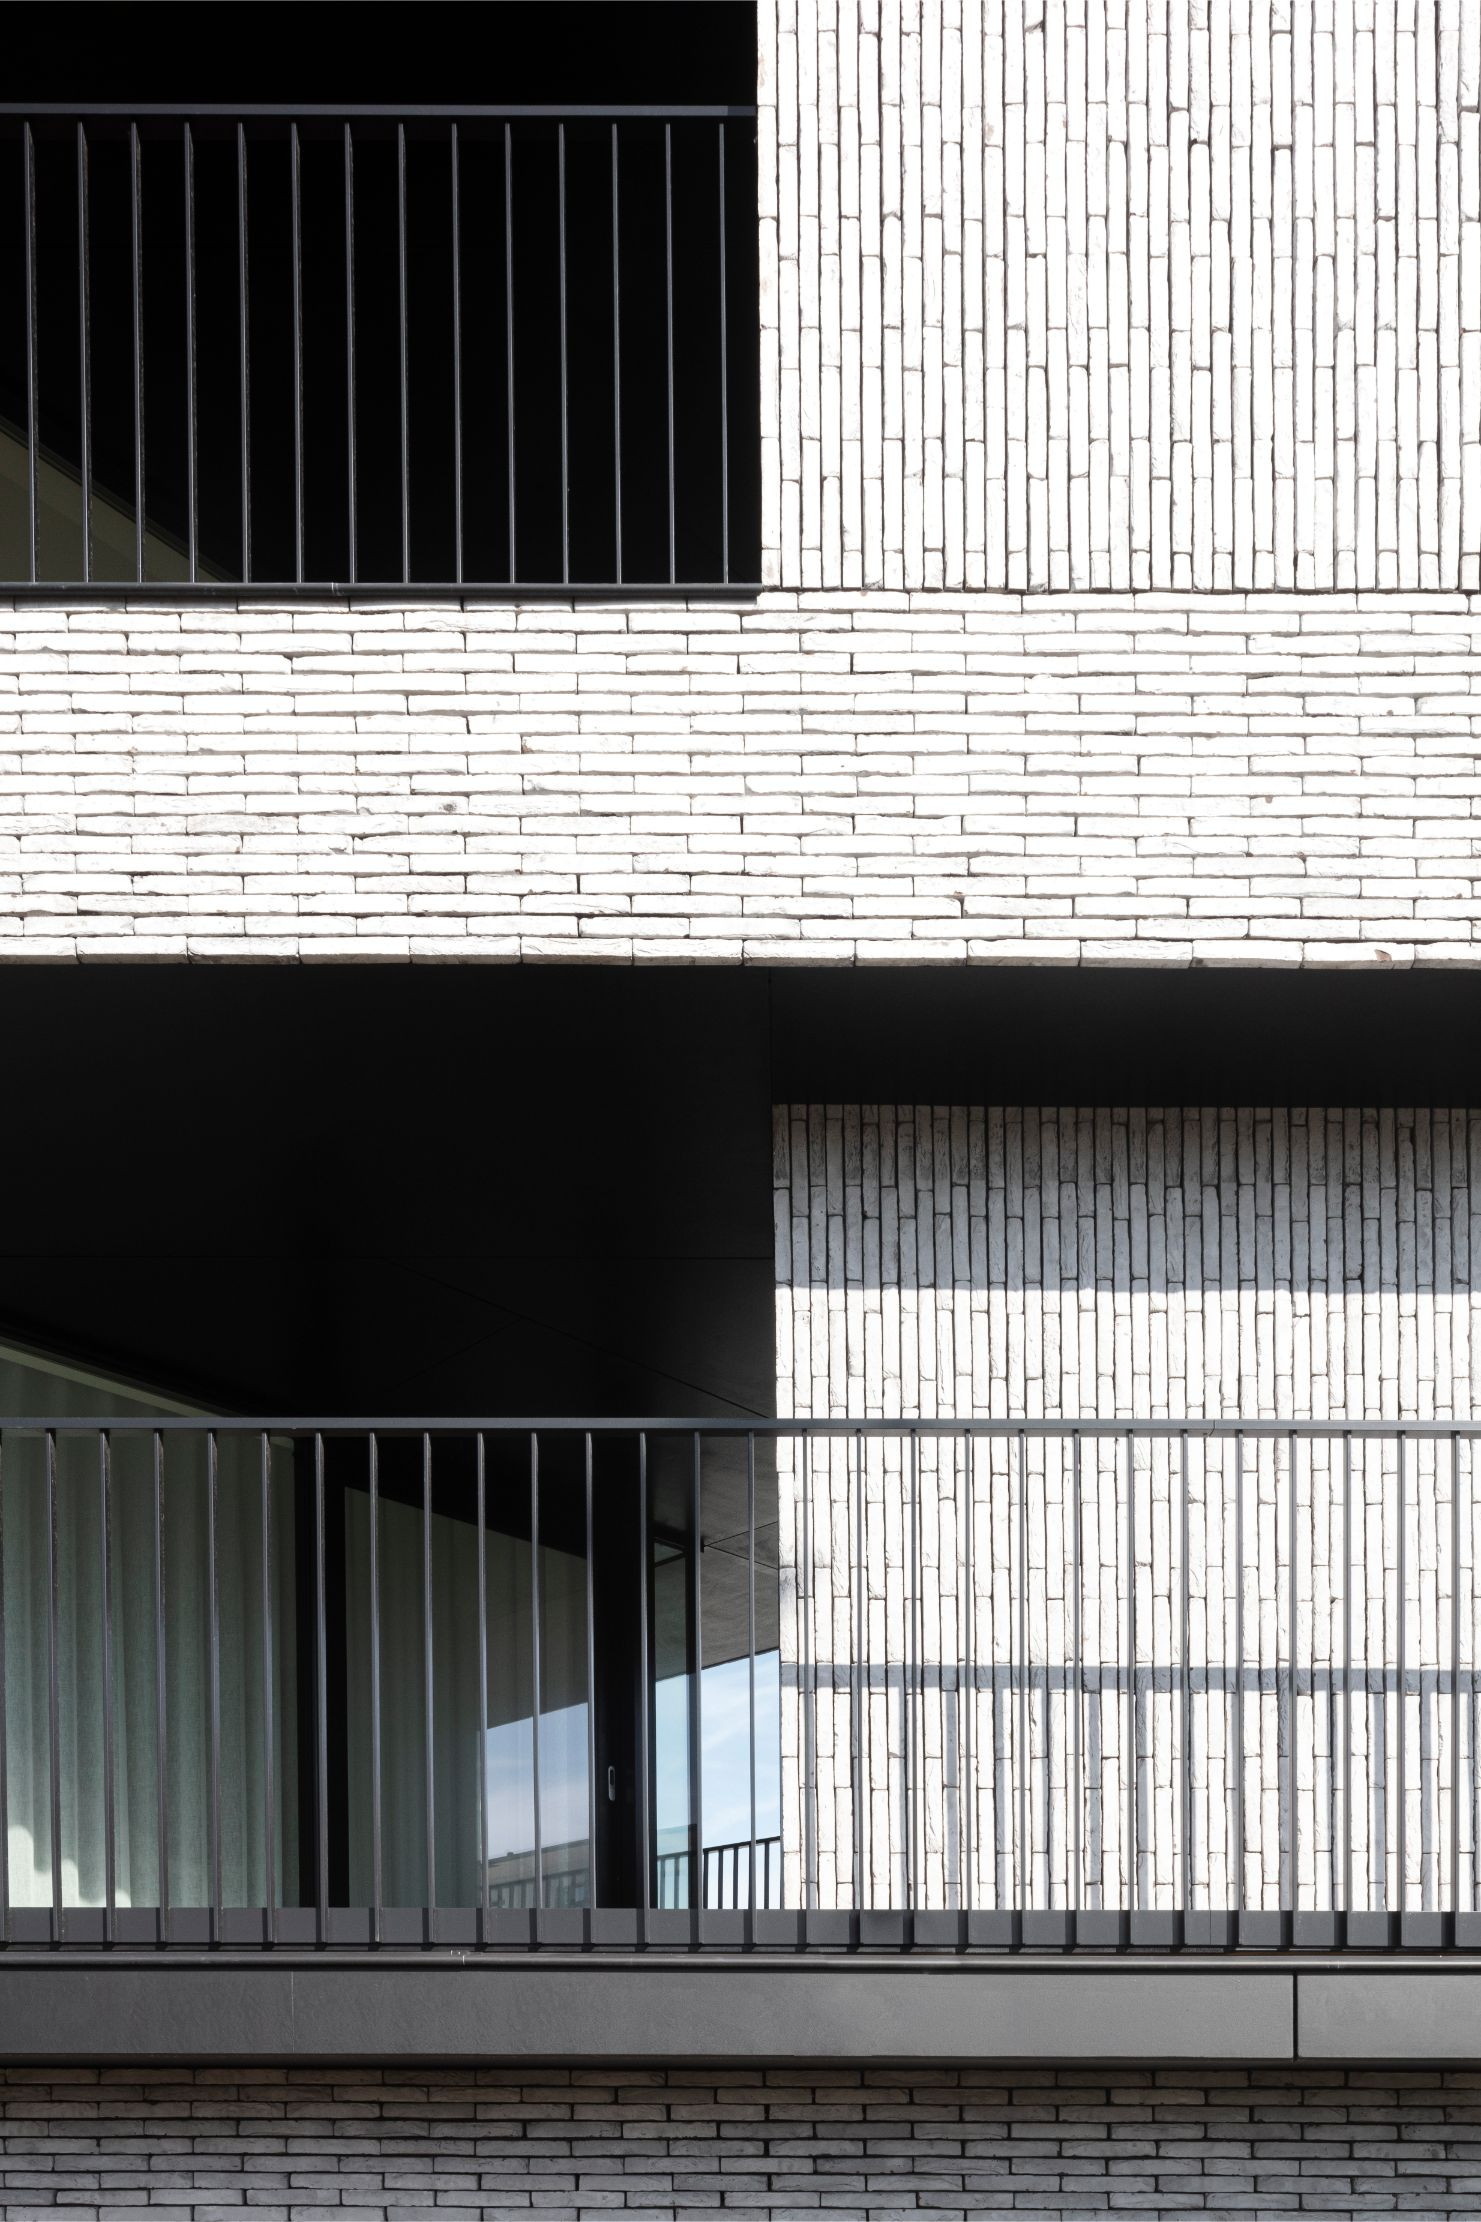 Pierre Paulin - Rietveldprojects - Sint-Idesbald - Tvdv8.jpg